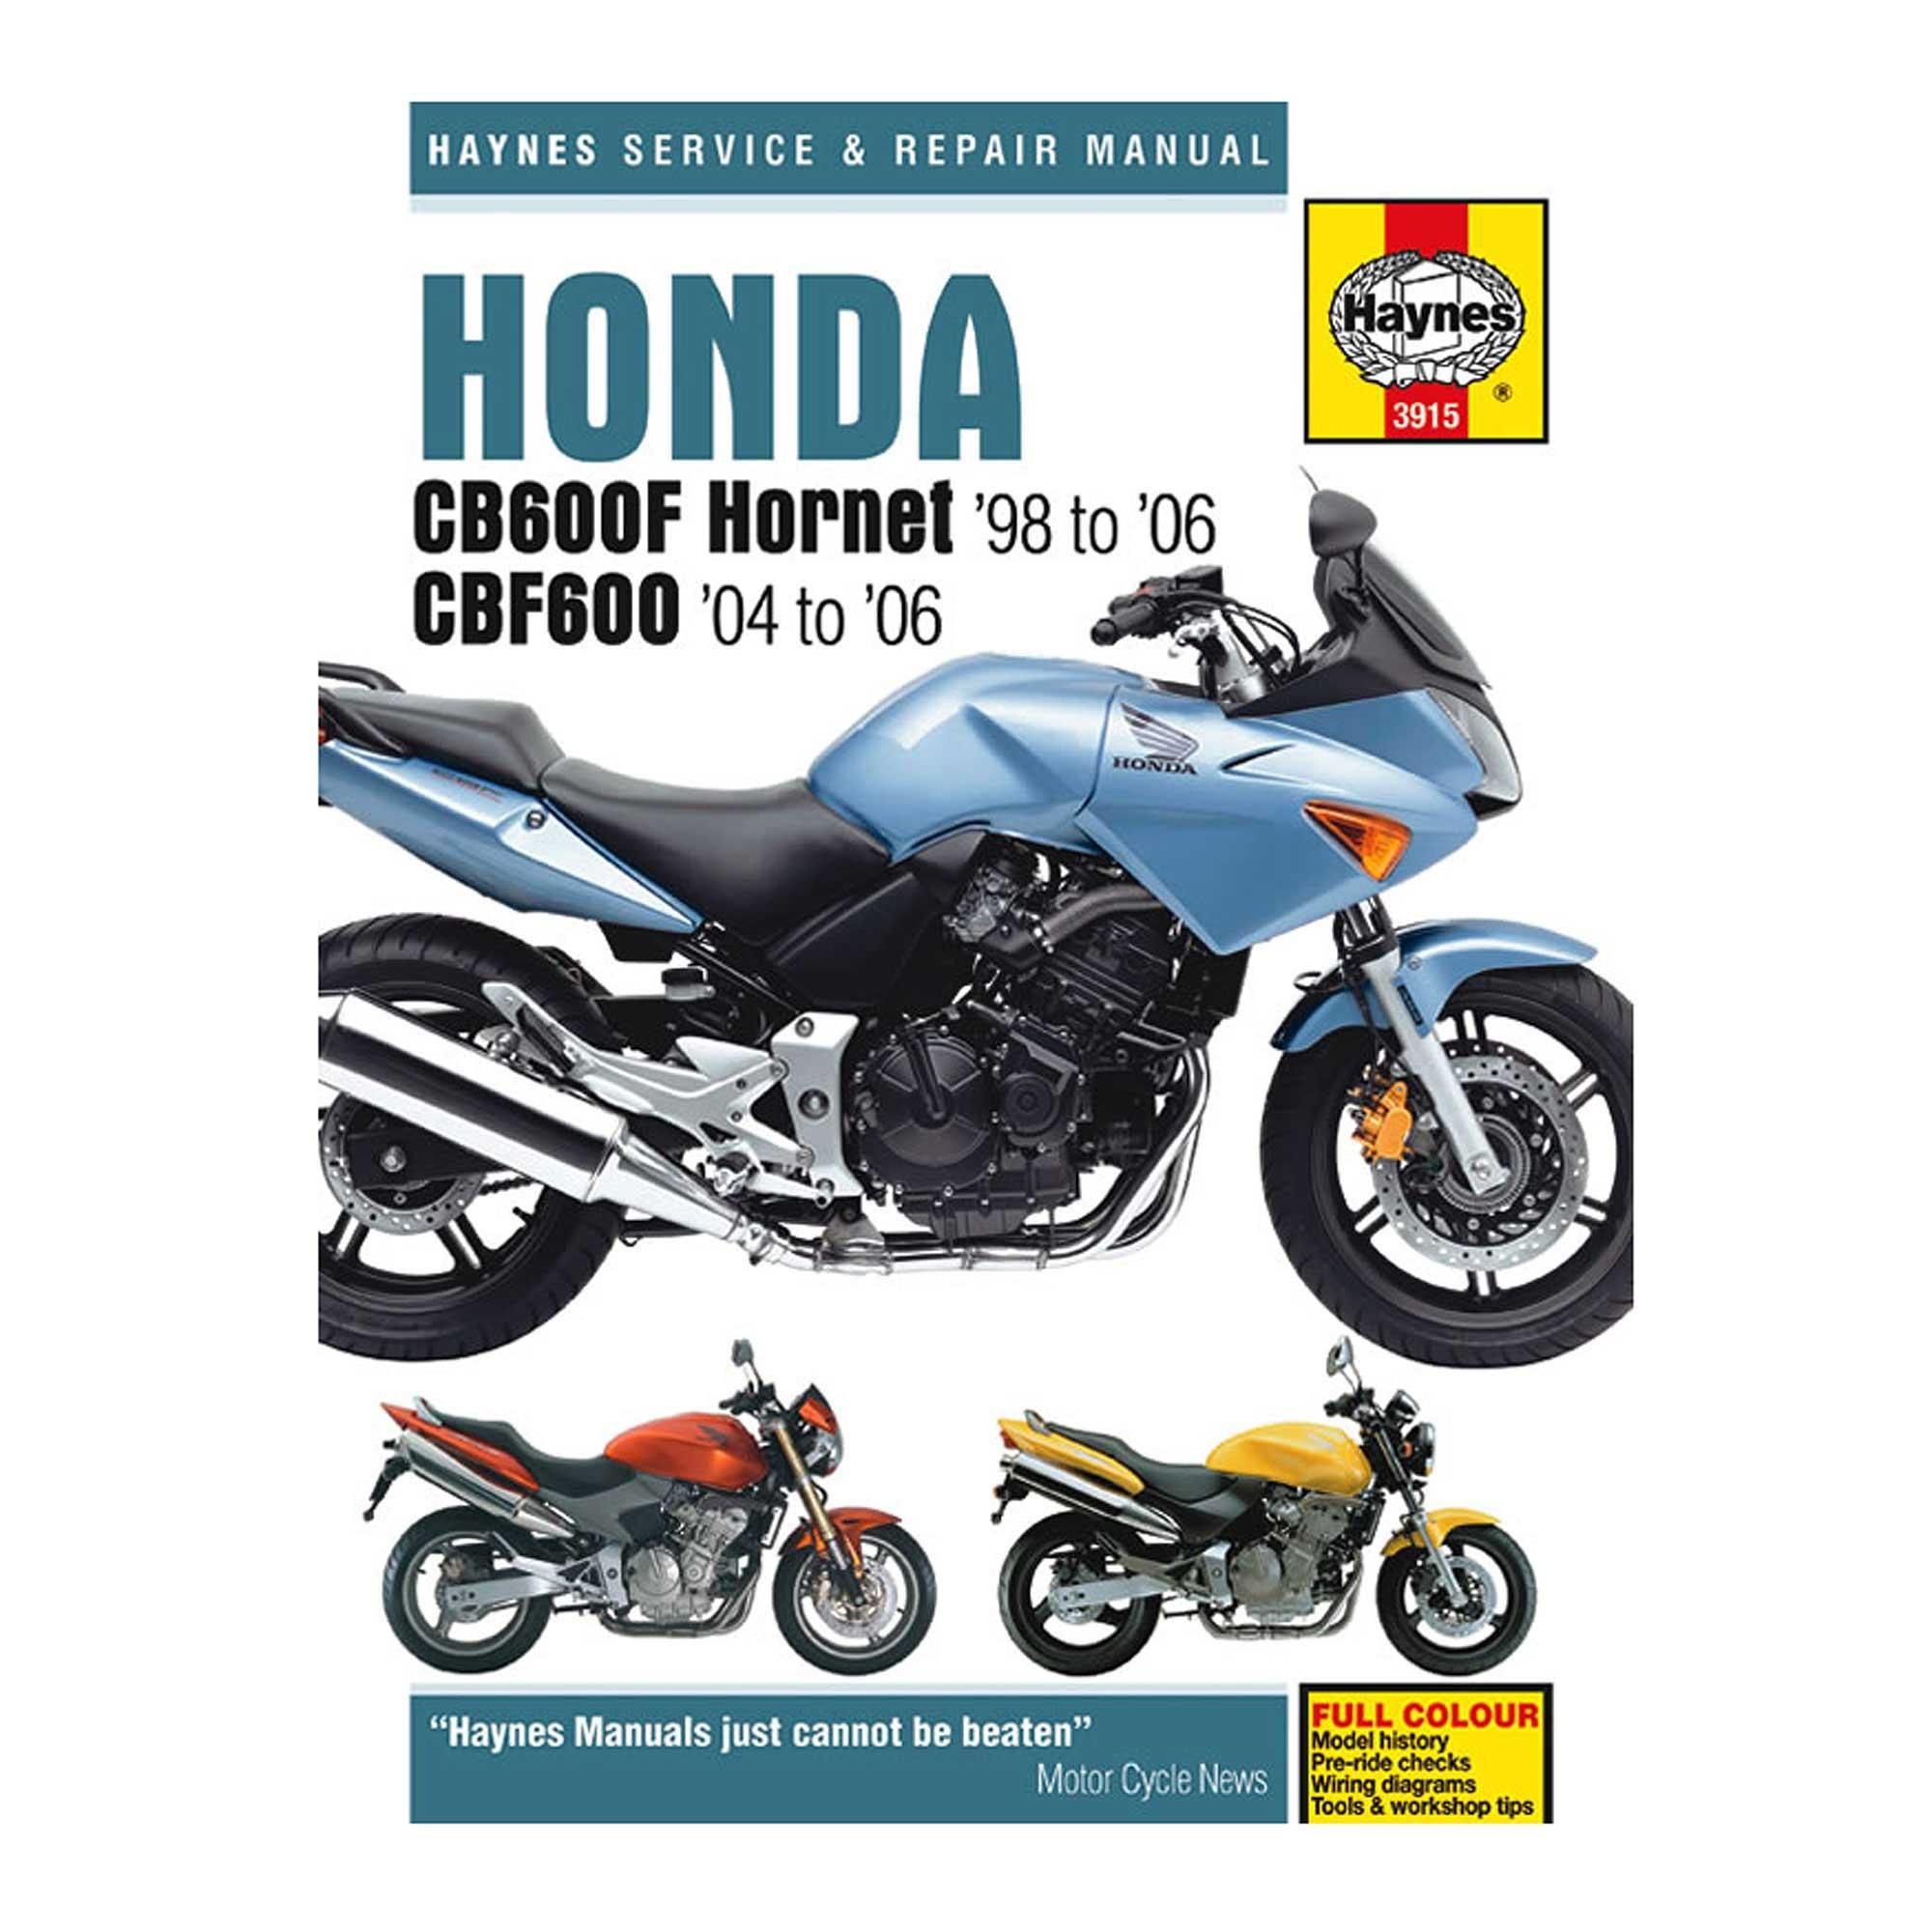 honda hornet 600 service manual pdf